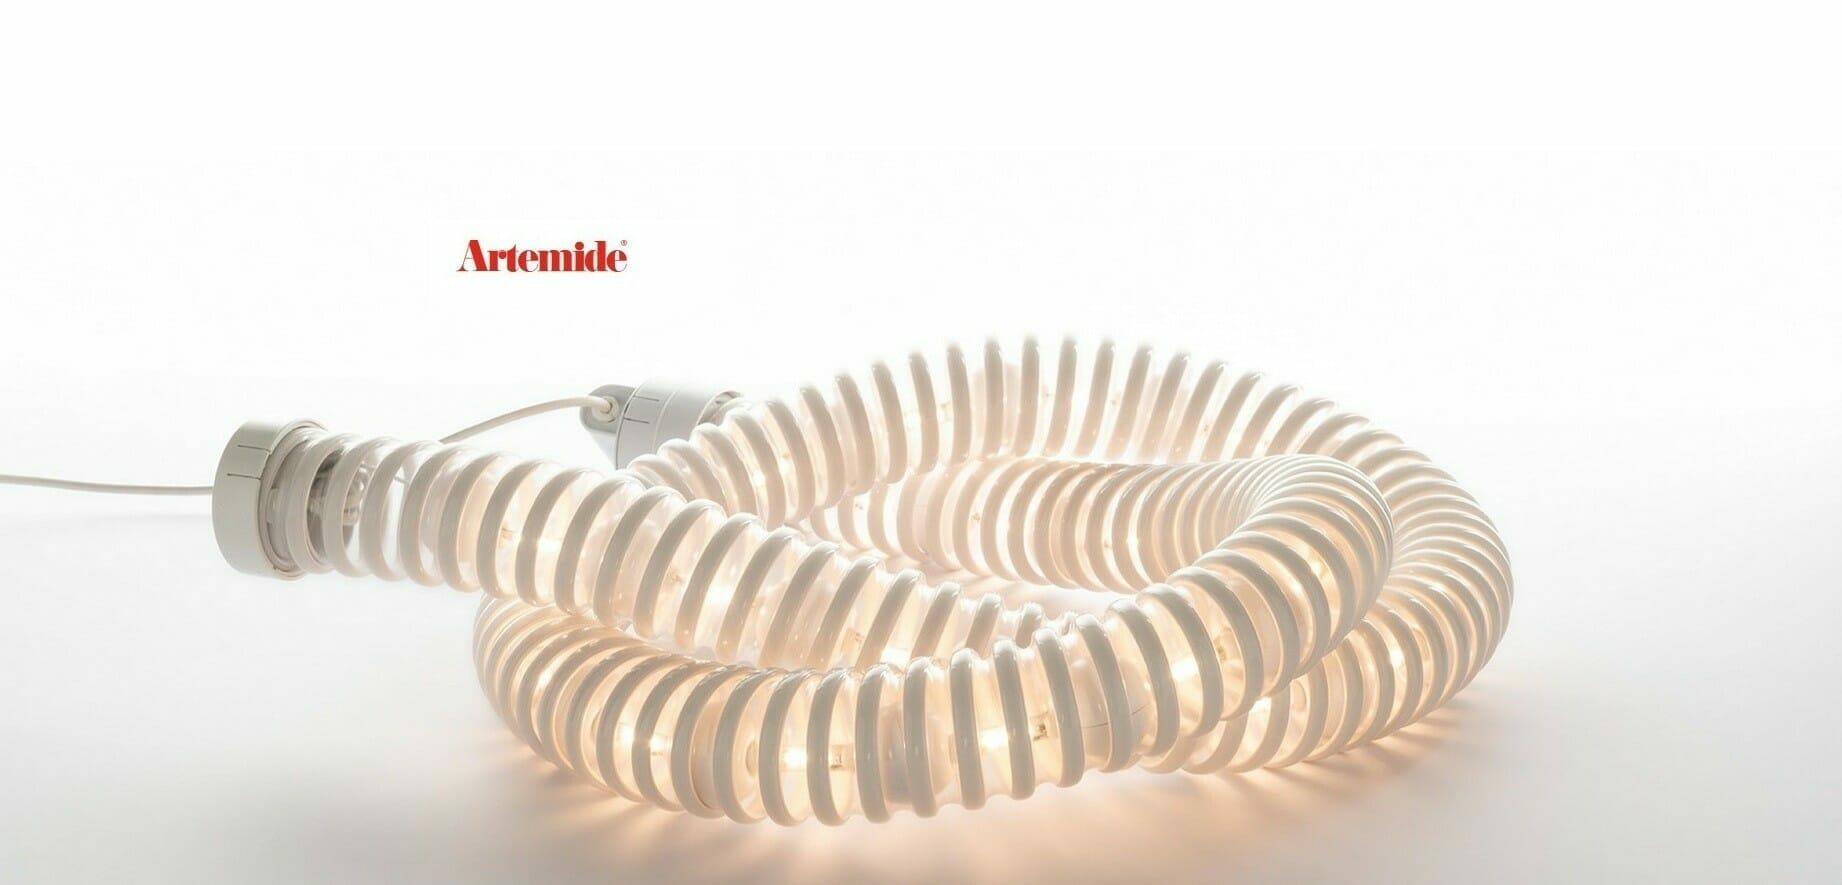 Boalum Artemide illuminazione lampada di design anni '70